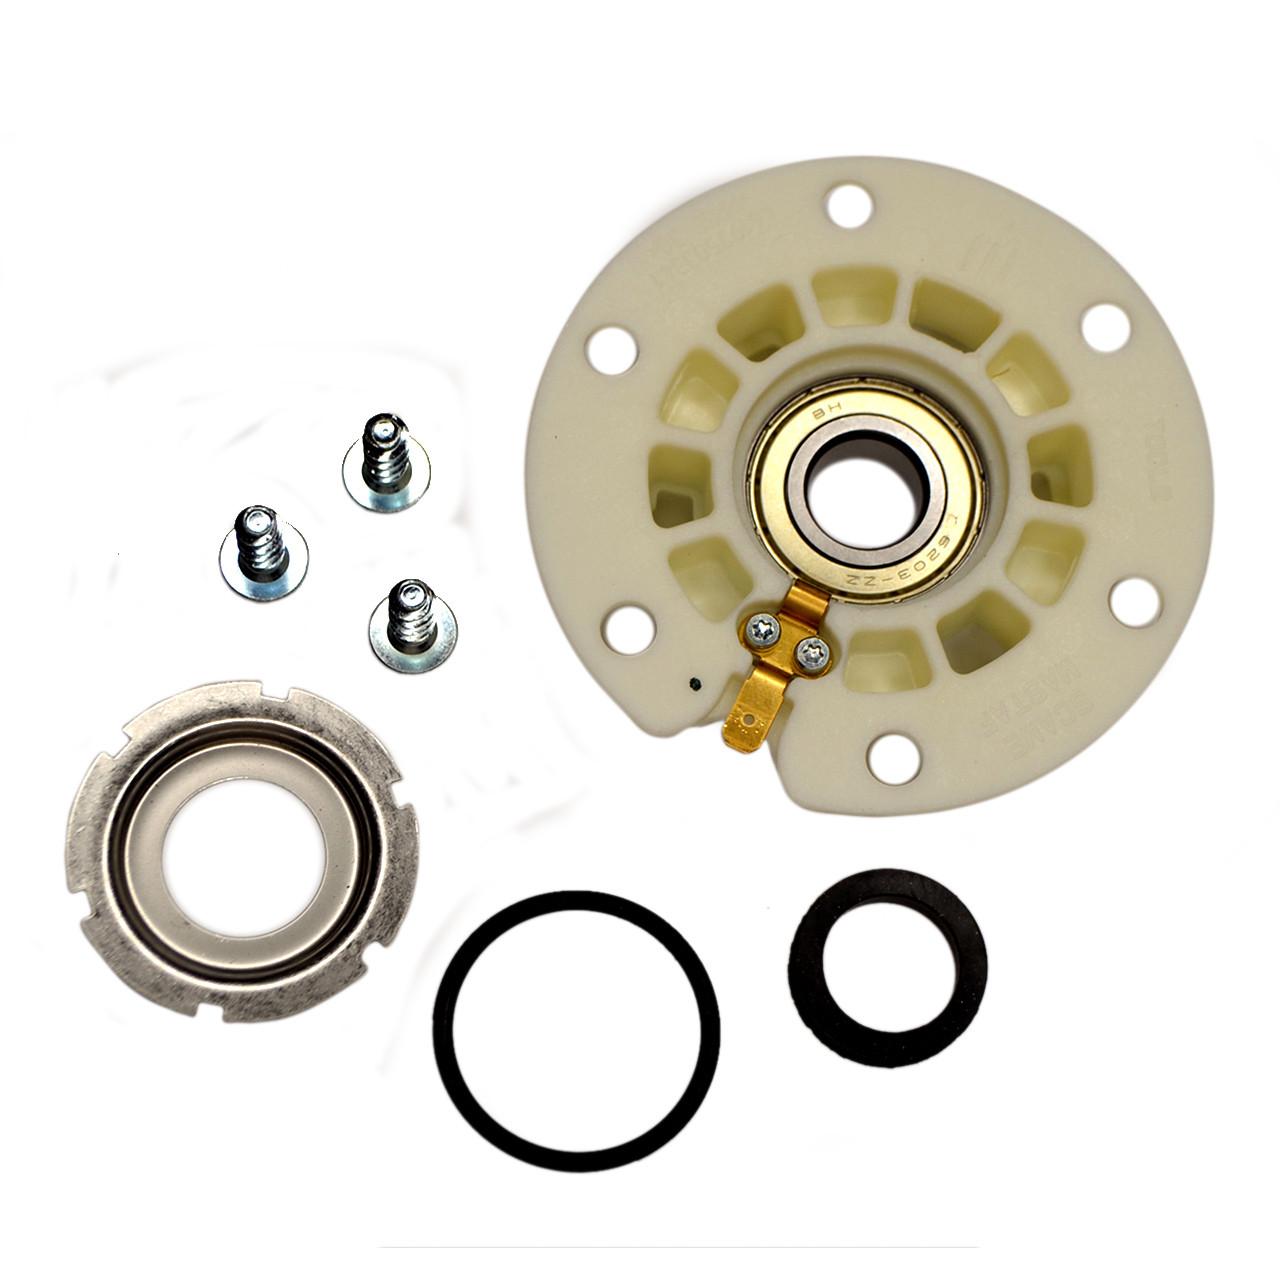 Суппорт Whirlpool (Indesit, Ariston, Bosch) 481231019144 Original 6203